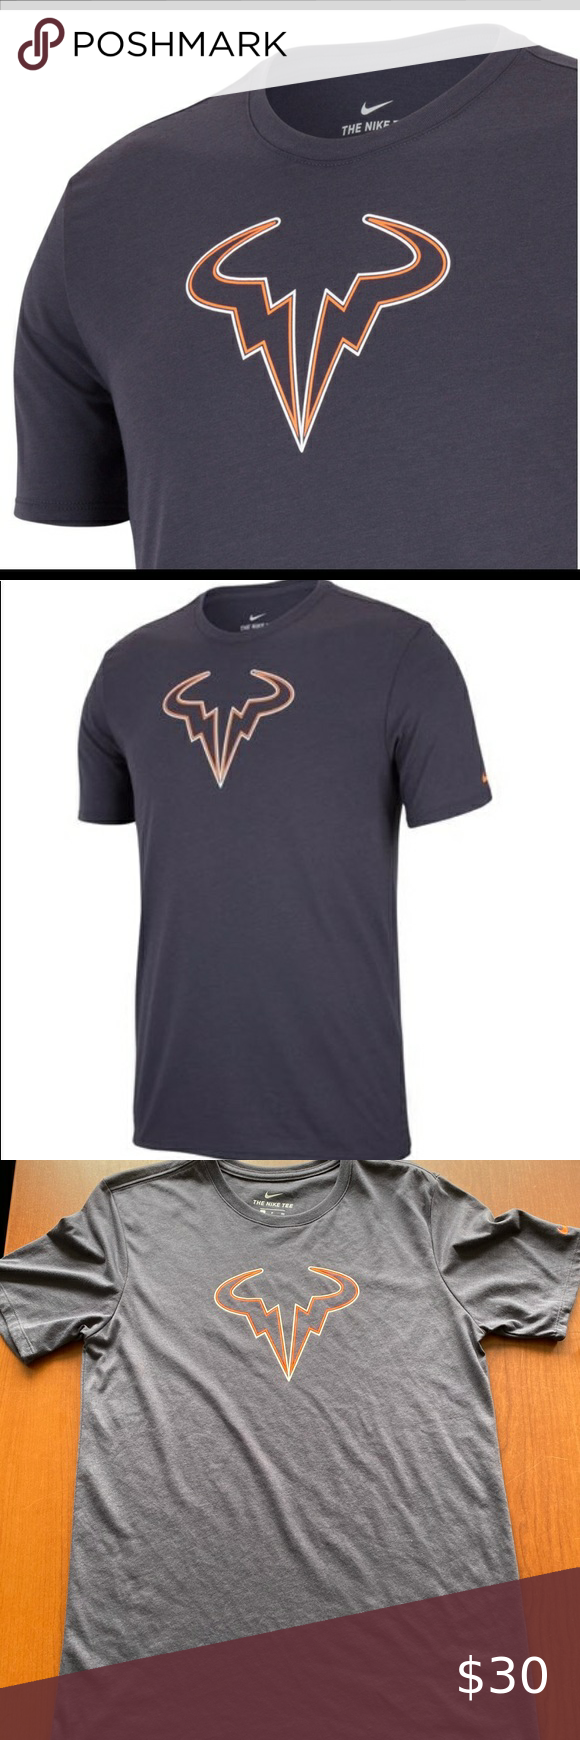 Nike Rafa Nadal Tee Bull Tennis Small New Tees Nike Nike Shirts